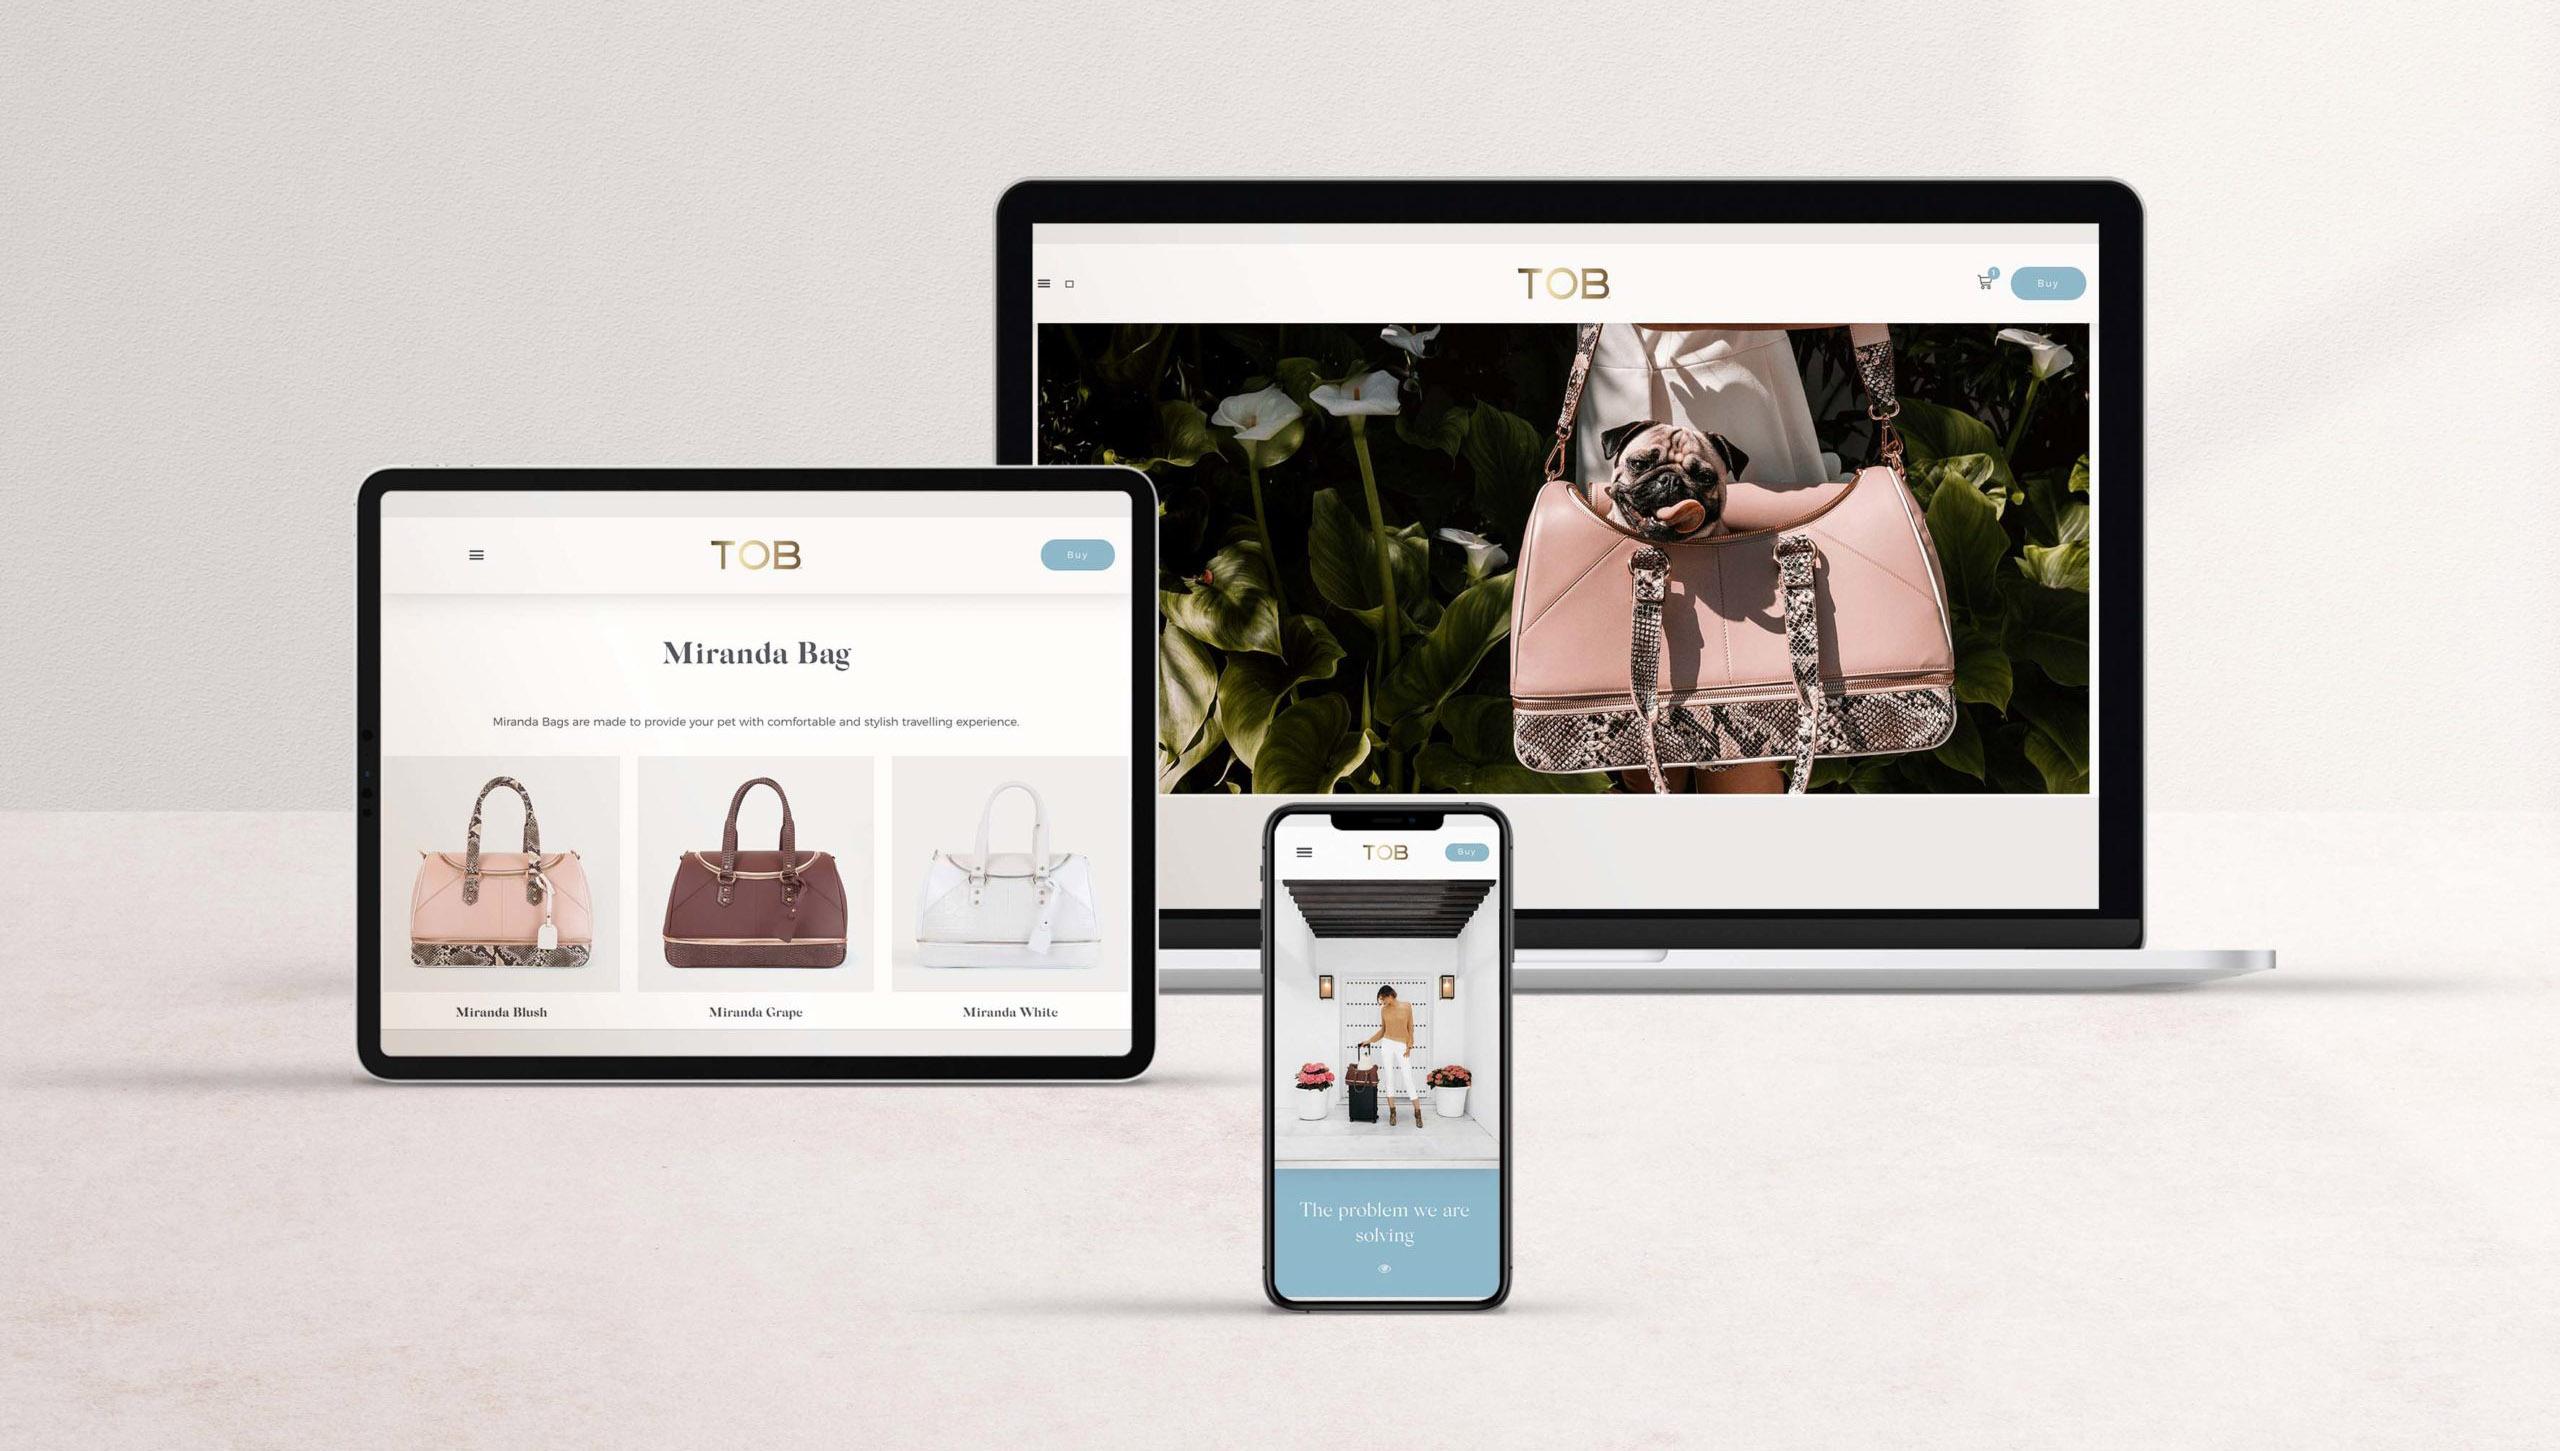 Marketing-Digies-TOB-Couture-E-Commerce-Project